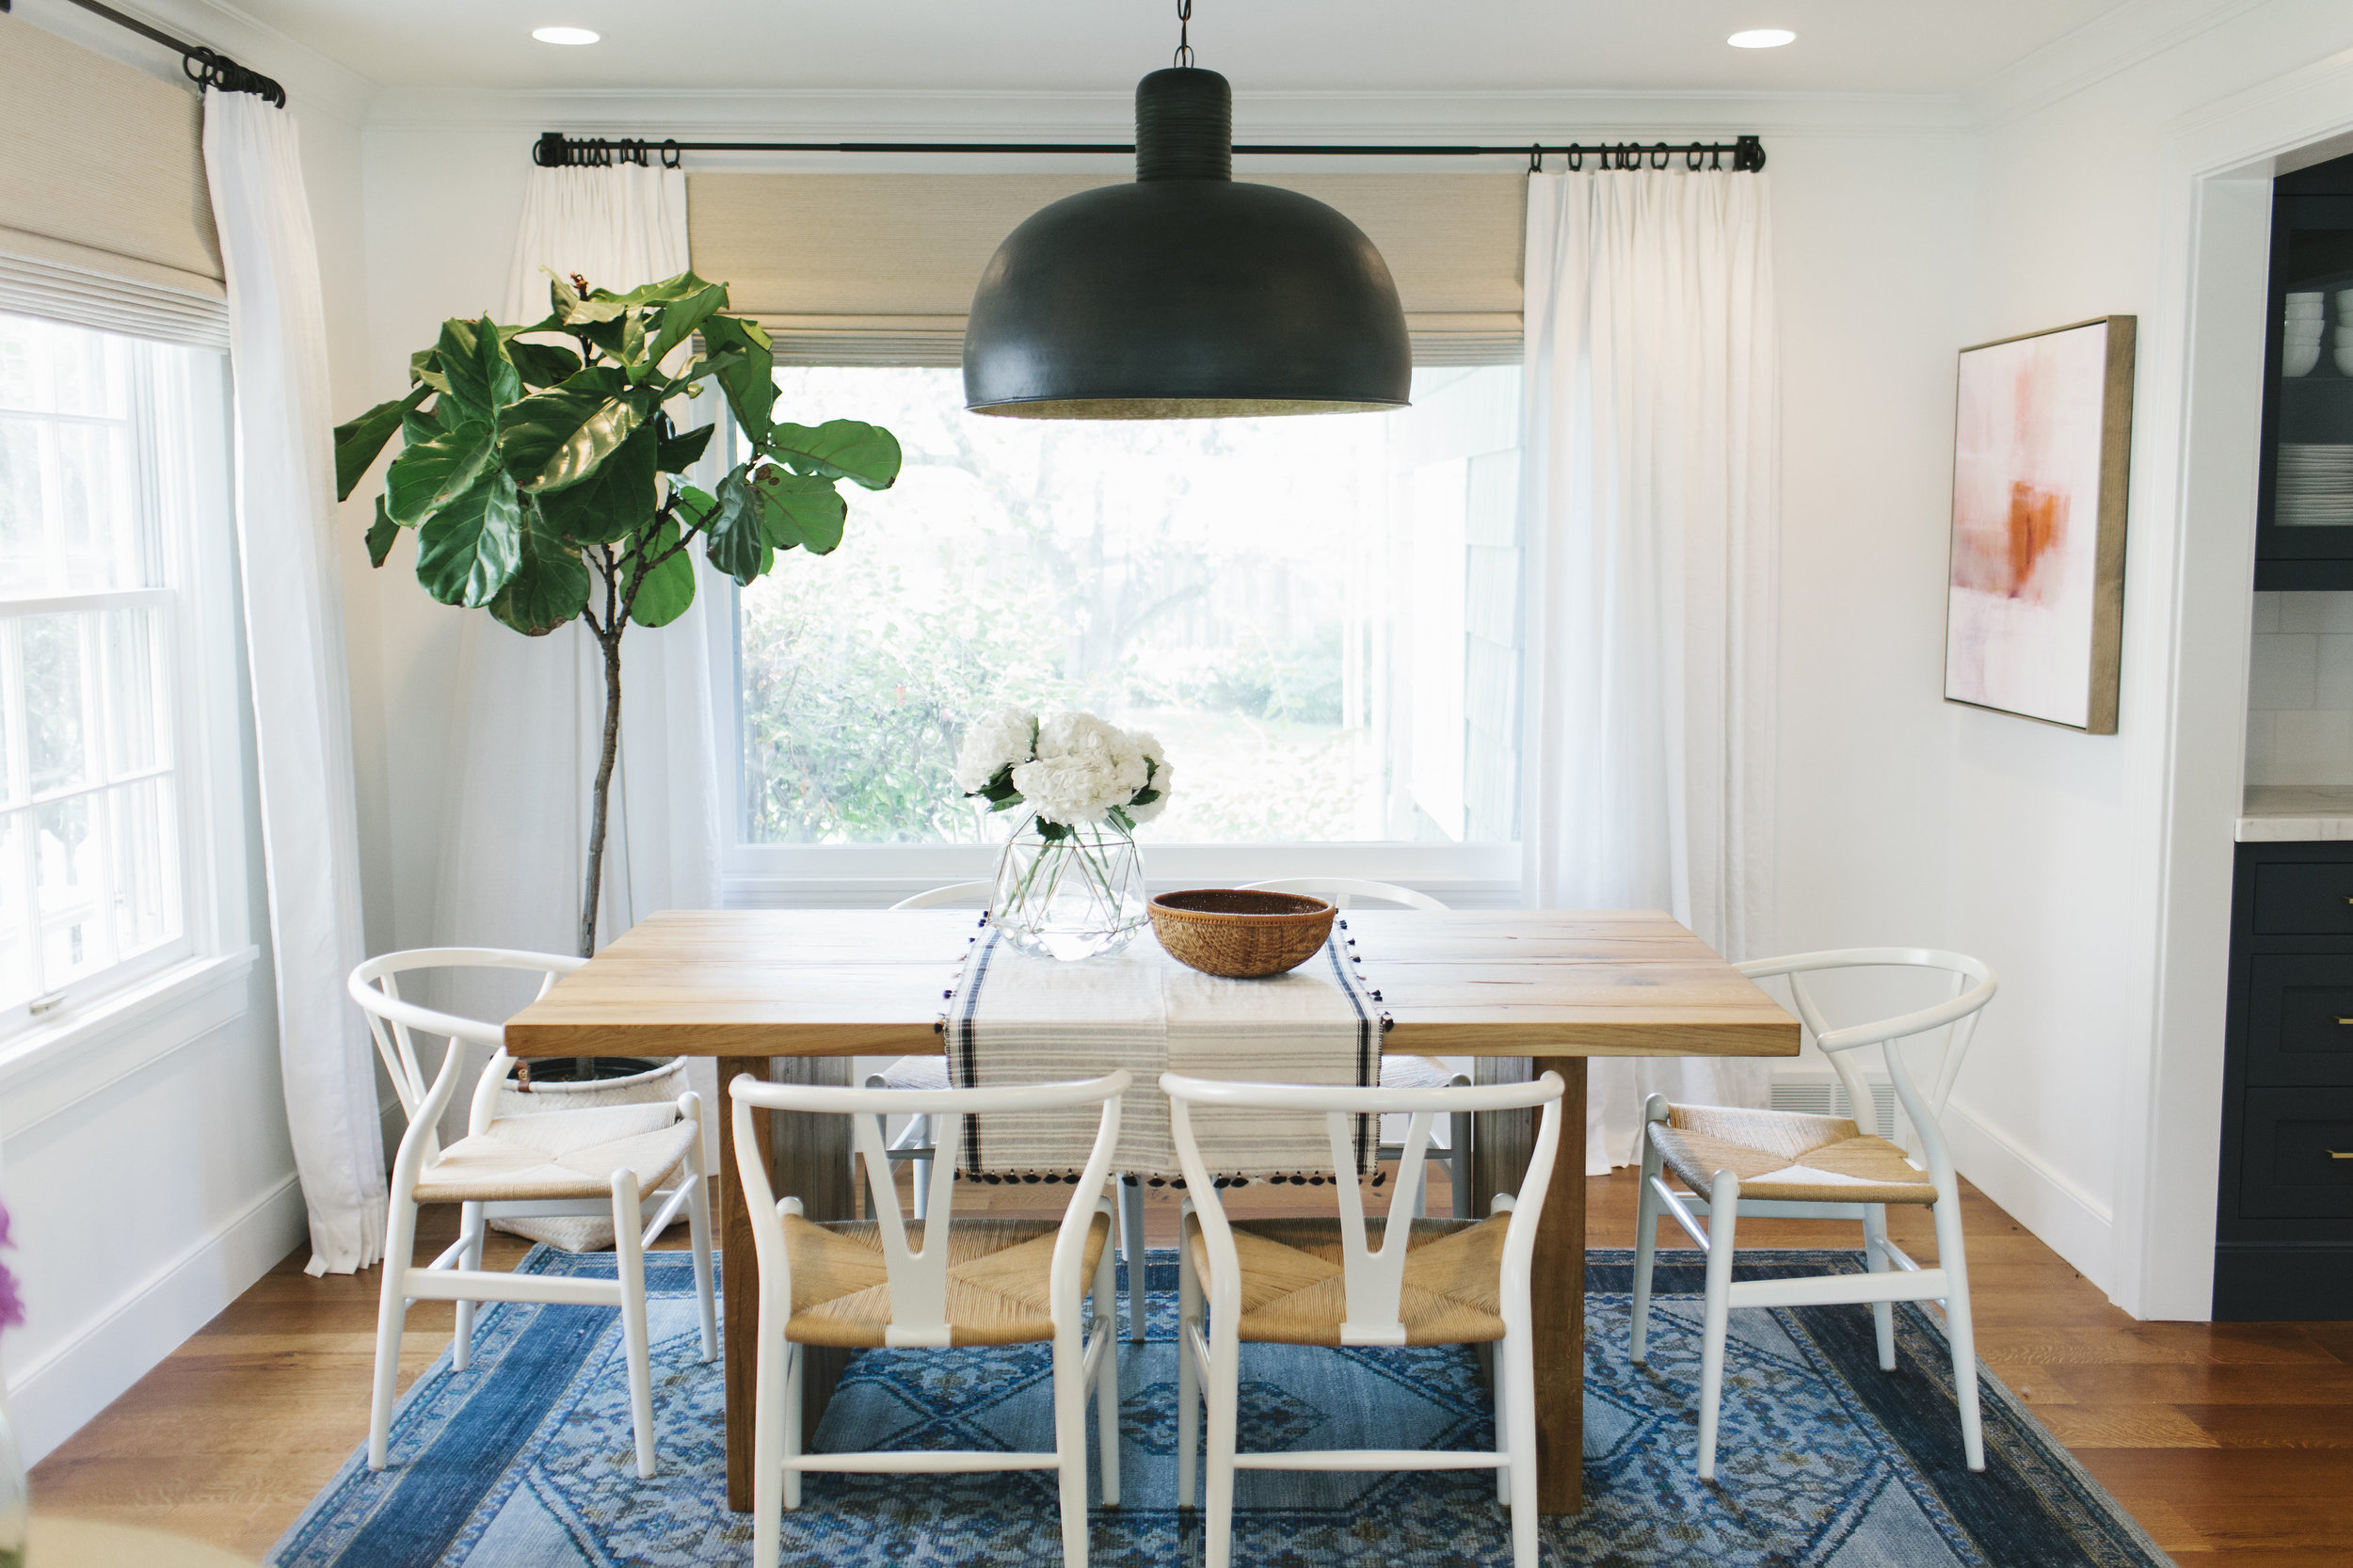 Studio McGee - Lynwood Remodel Dining Area